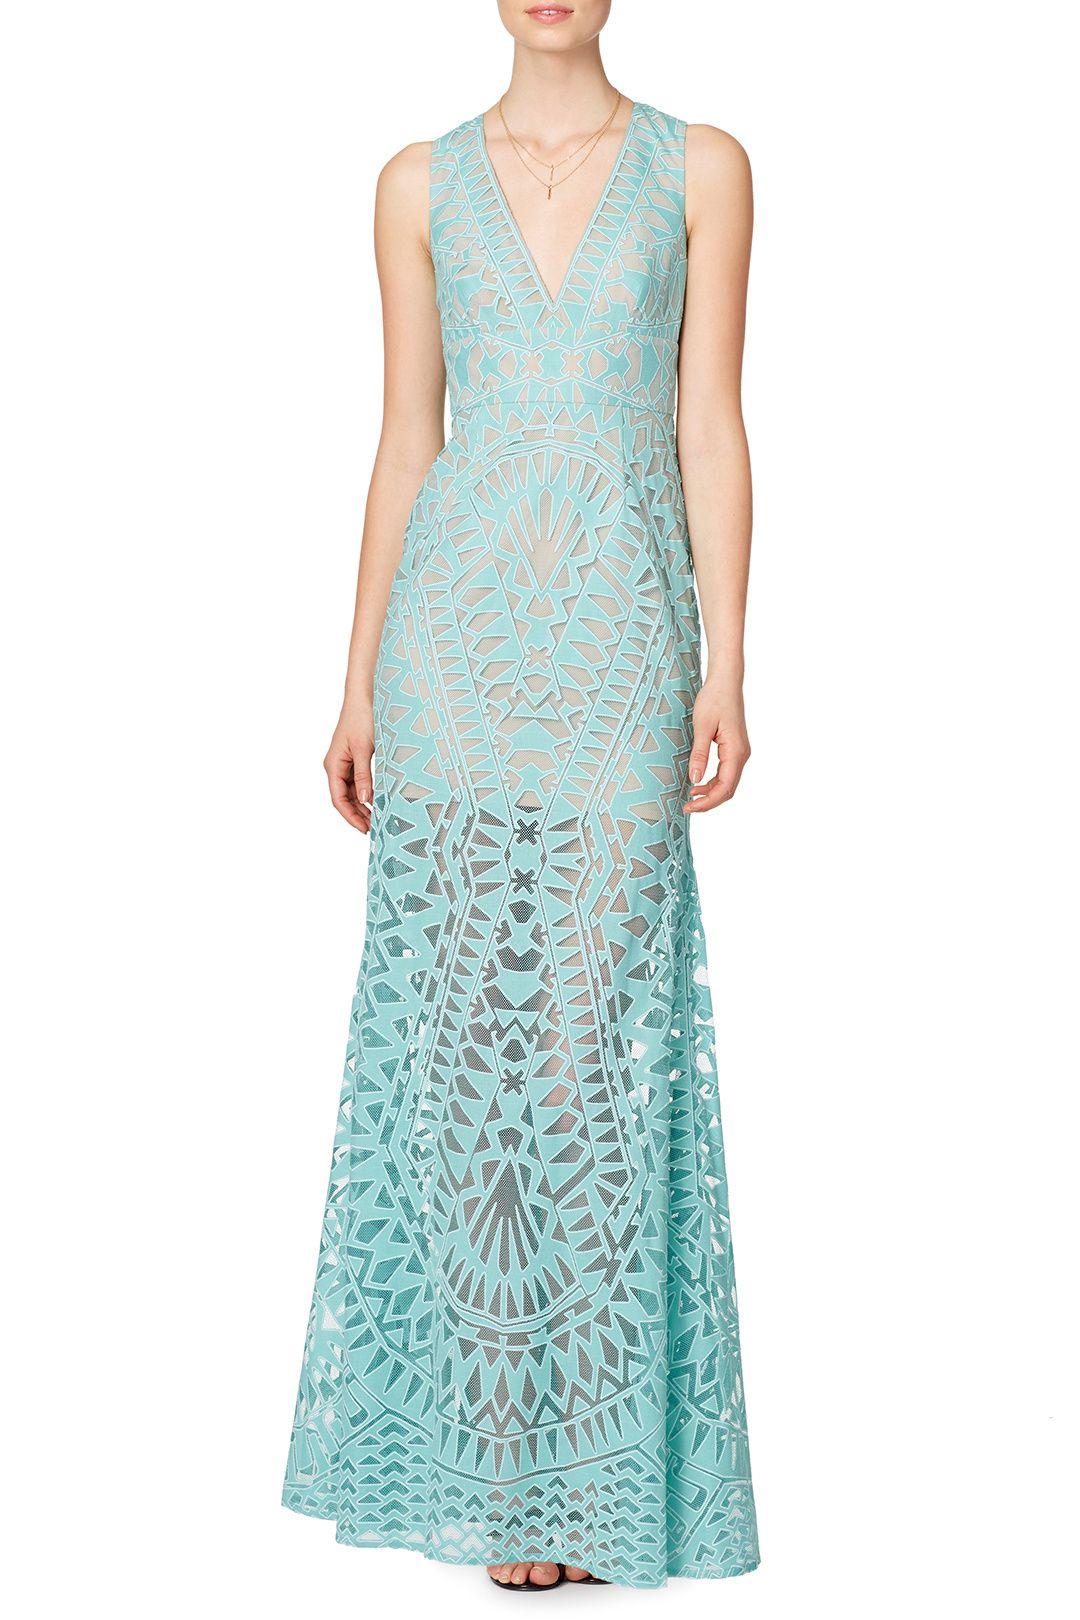 Aqua chakra gown shops uxui designer and the oujays